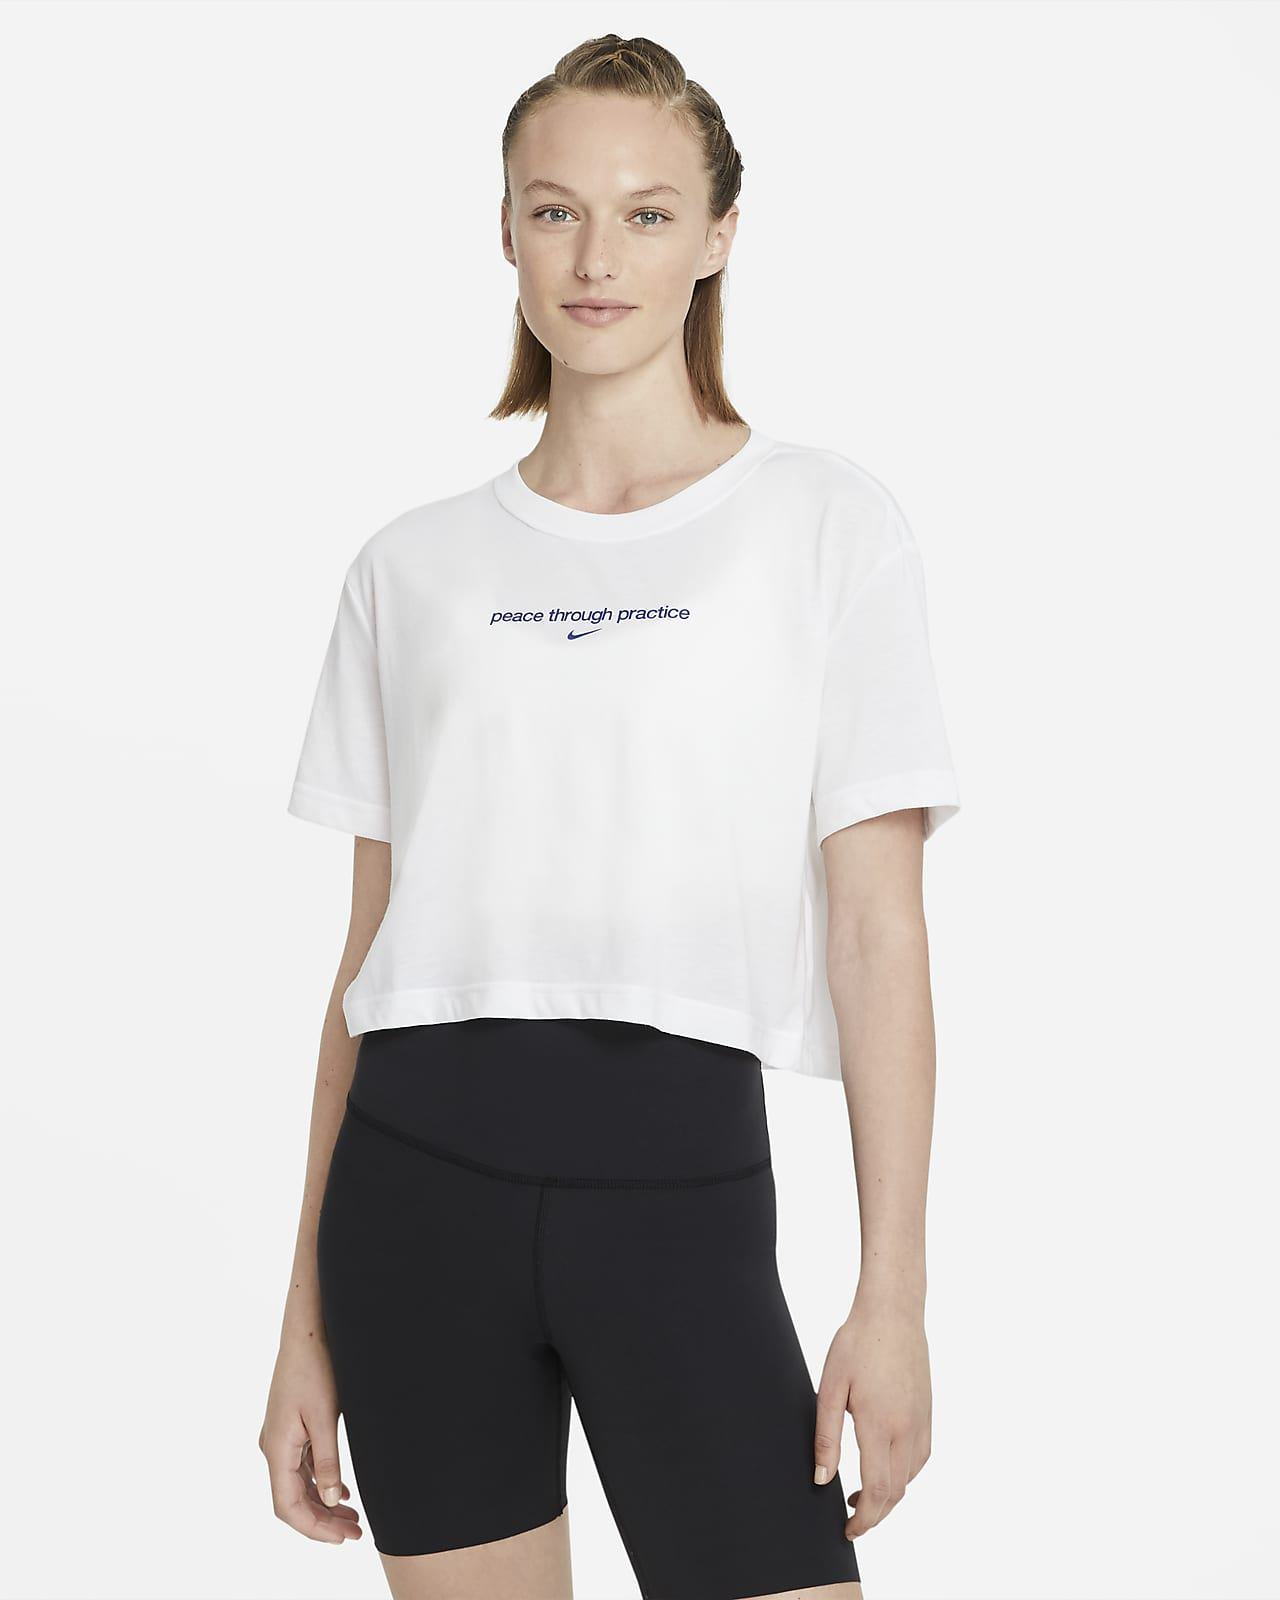 Nike Yoga Kurz-Grafik-T-Shirt für Damen